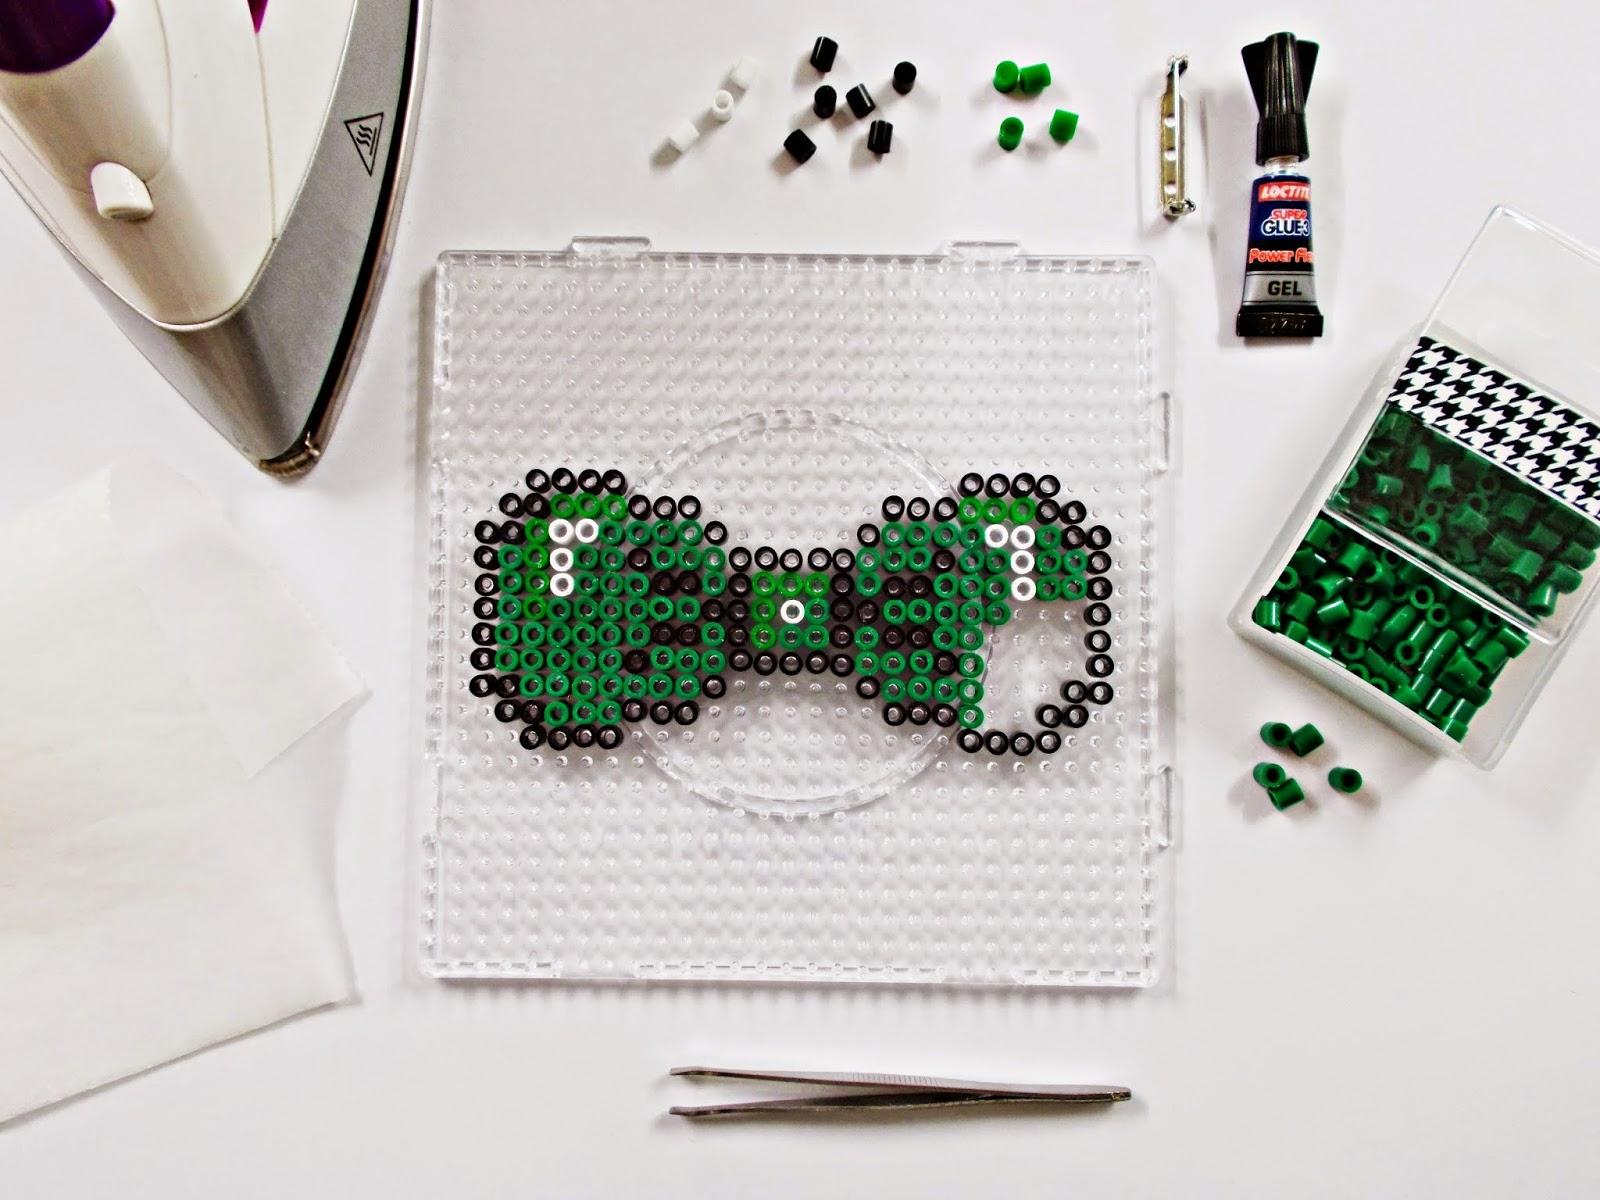 DIY-pajarita-tie bow-hama beads- DoItYourself-idea-moda-broche-2